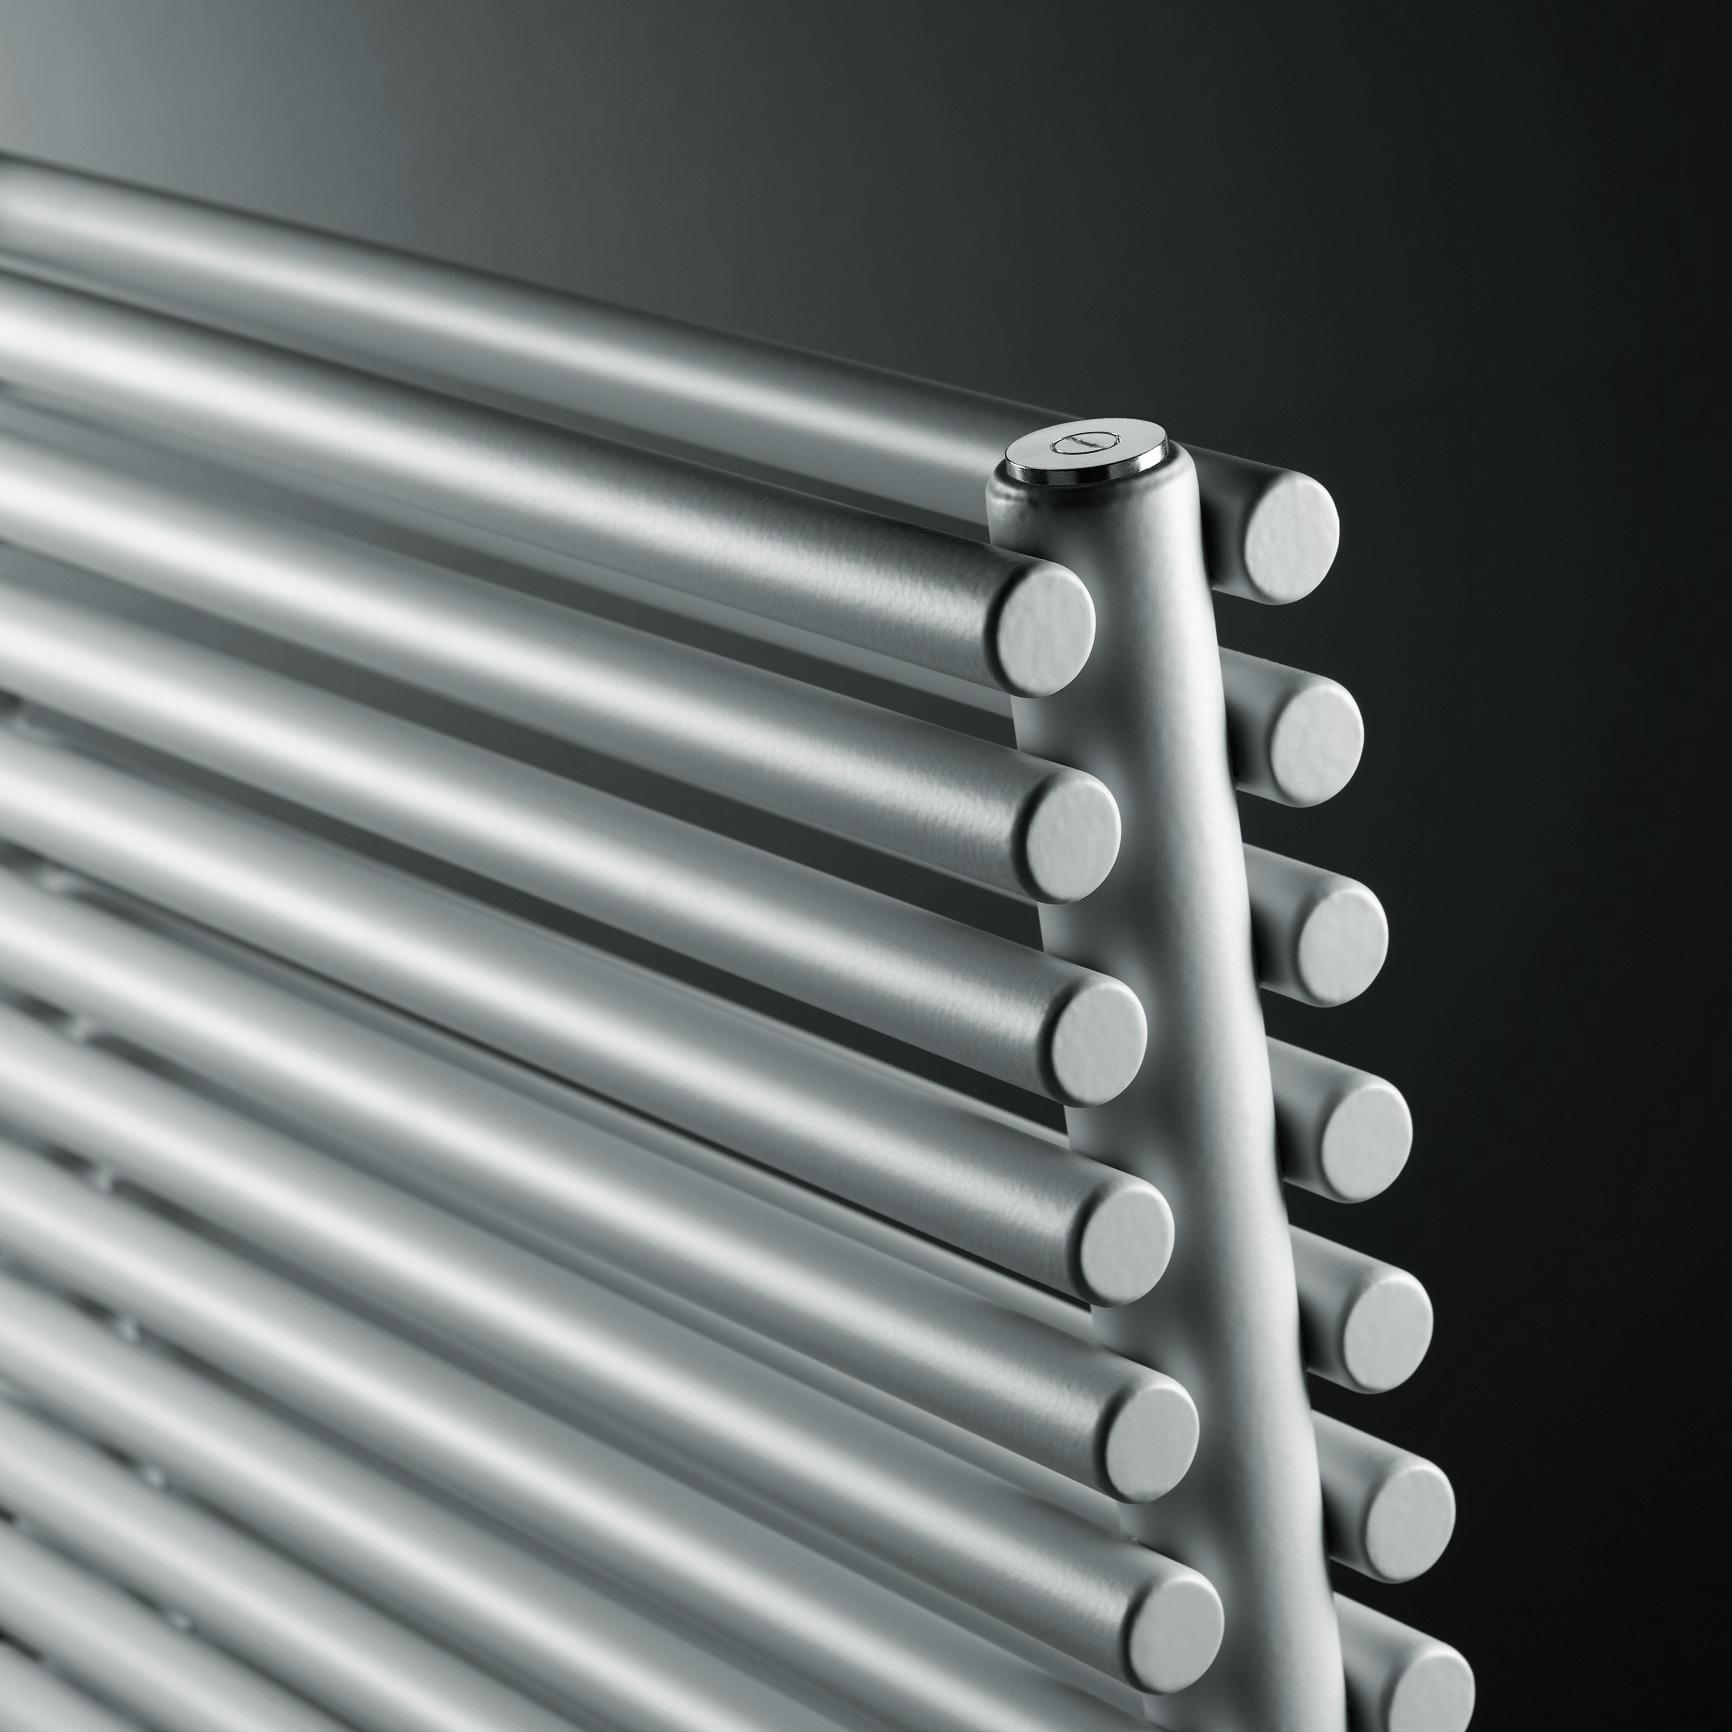 vasco agave hr2 heizk rper zweireihig breite 50 cm 1500 watt 111770500201400189016 0000. Black Bedroom Furniture Sets. Home Design Ideas